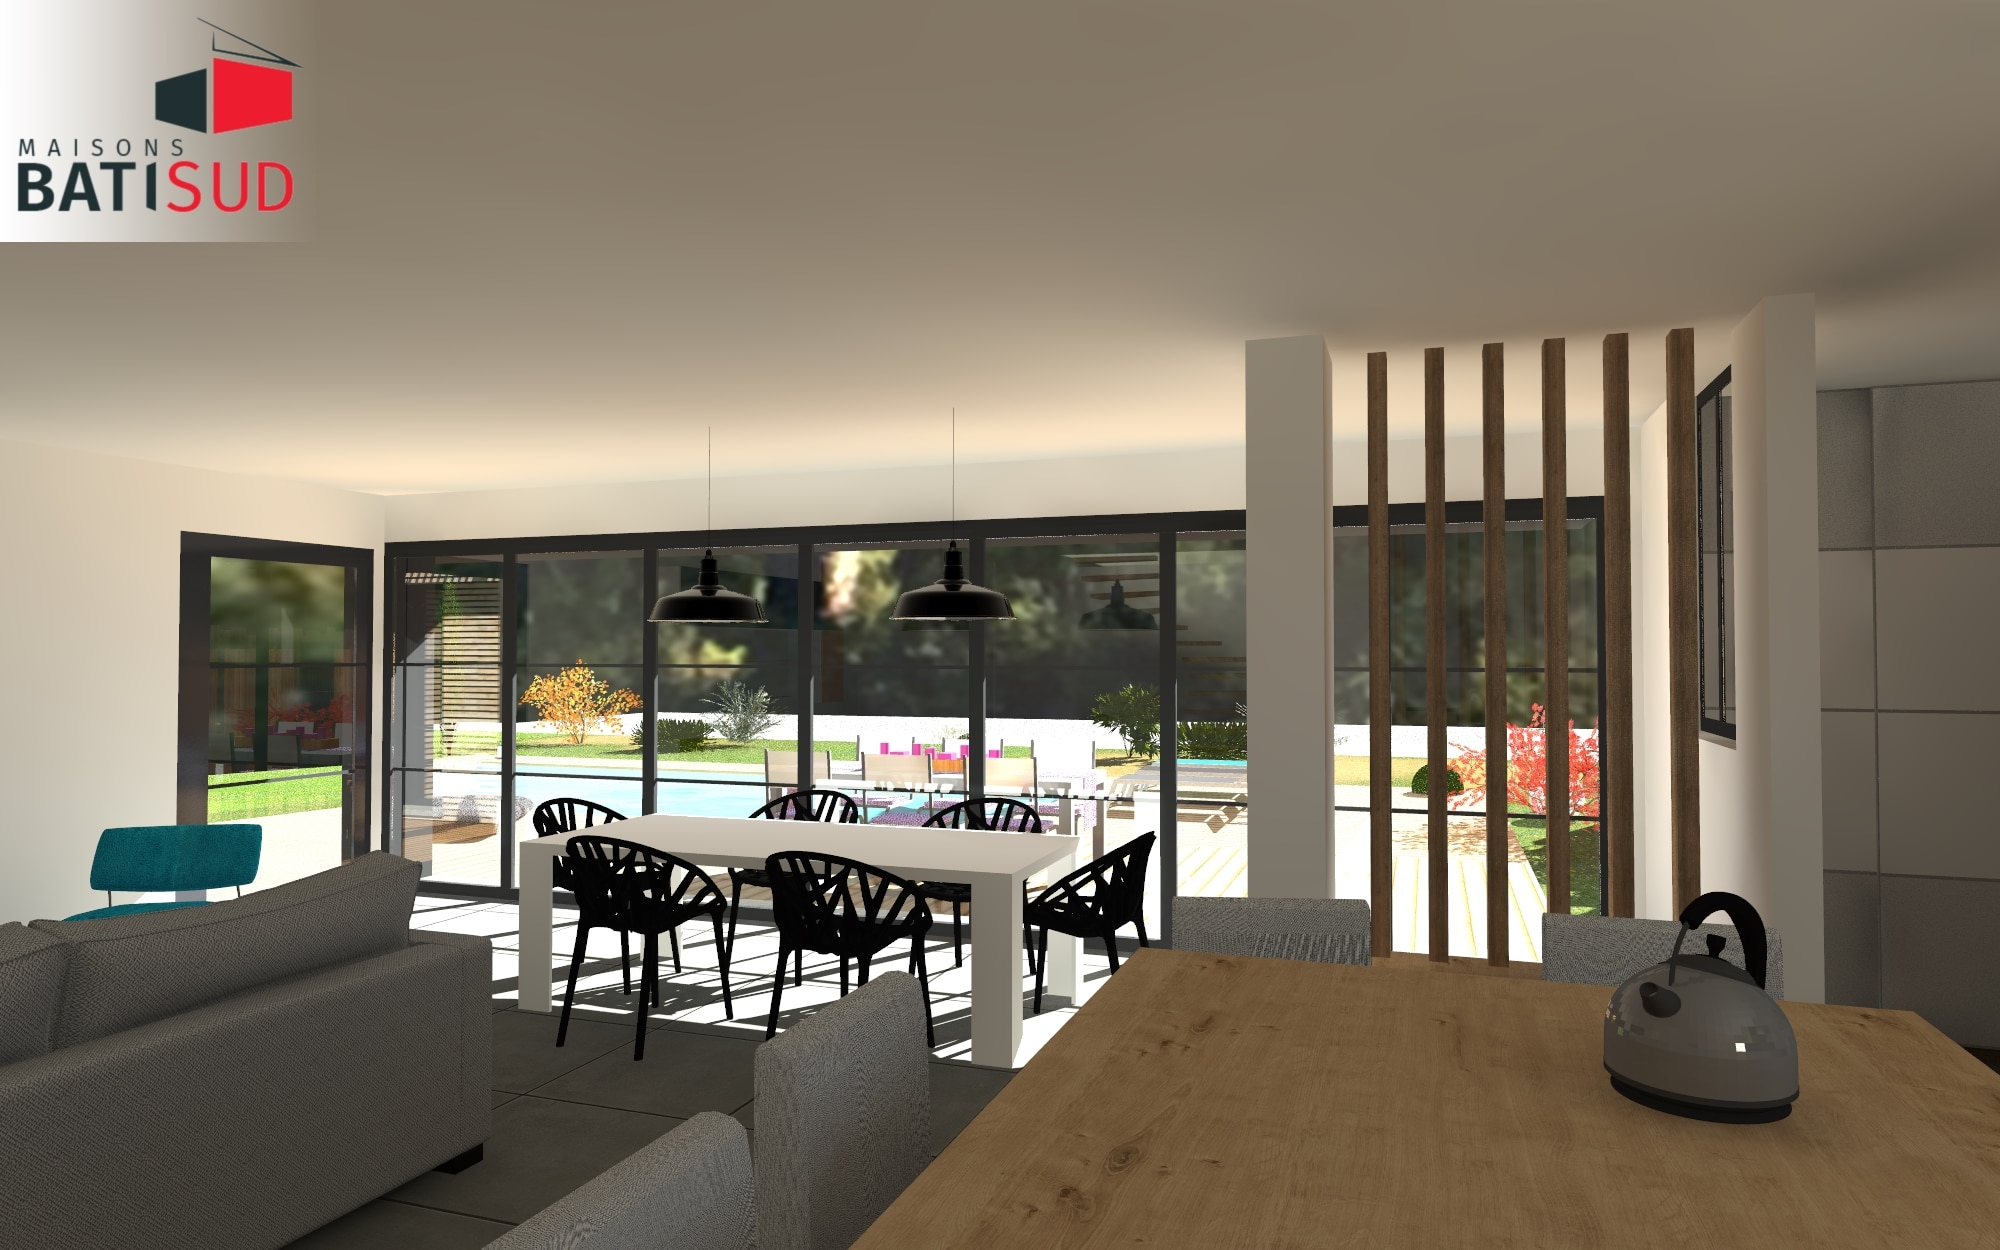 maisons bati sud construction andernos 3 maisons bati sud. Black Bedroom Furniture Sets. Home Design Ideas